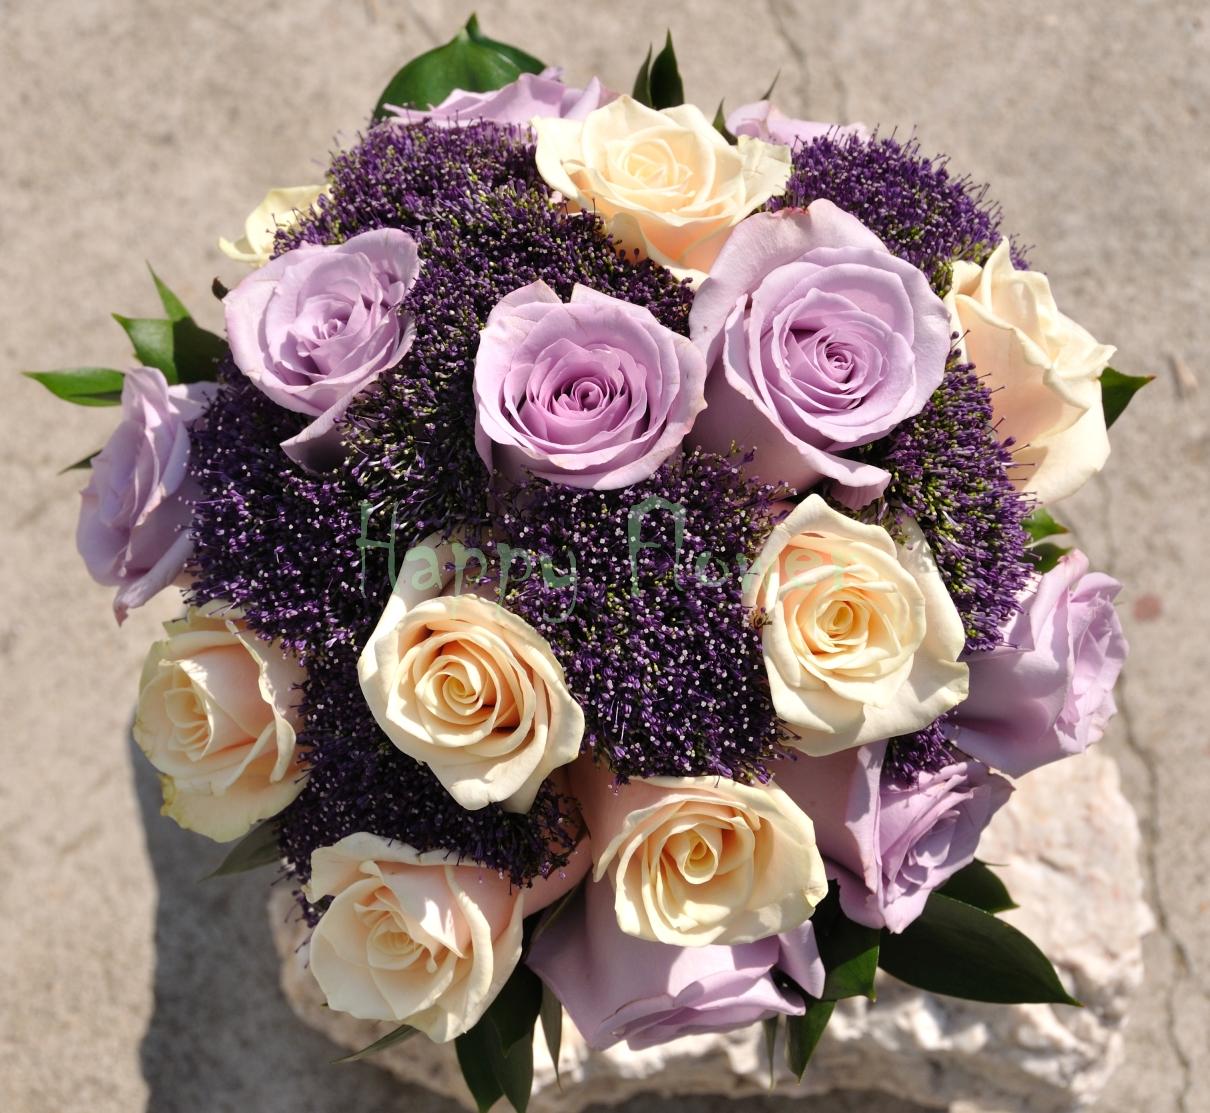 Buchet Mireasa Trandafiri Mov Si Crem Trachelium Mov Happy Flower